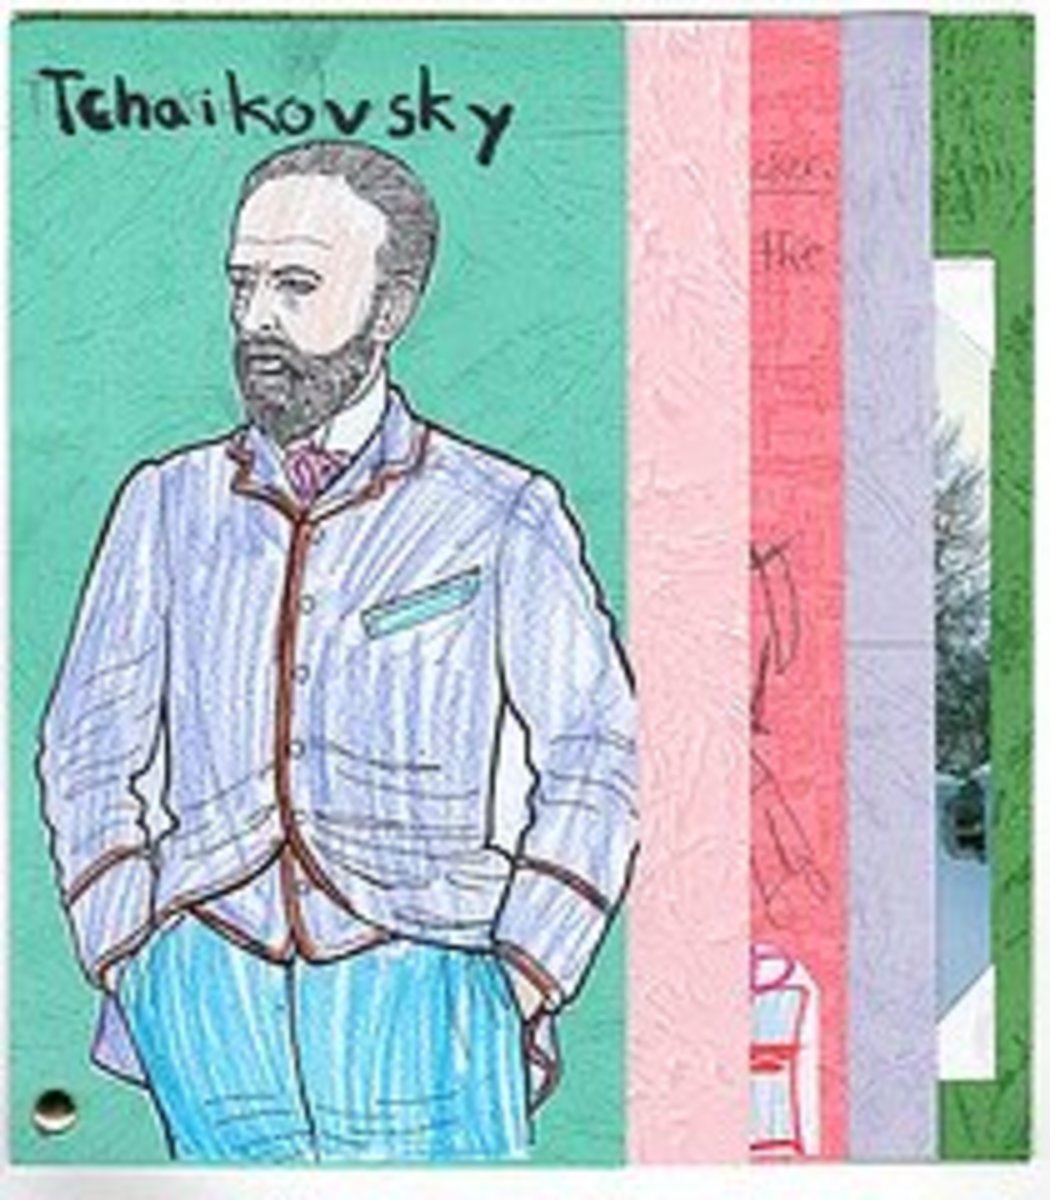 tchaikovsky-composer-study